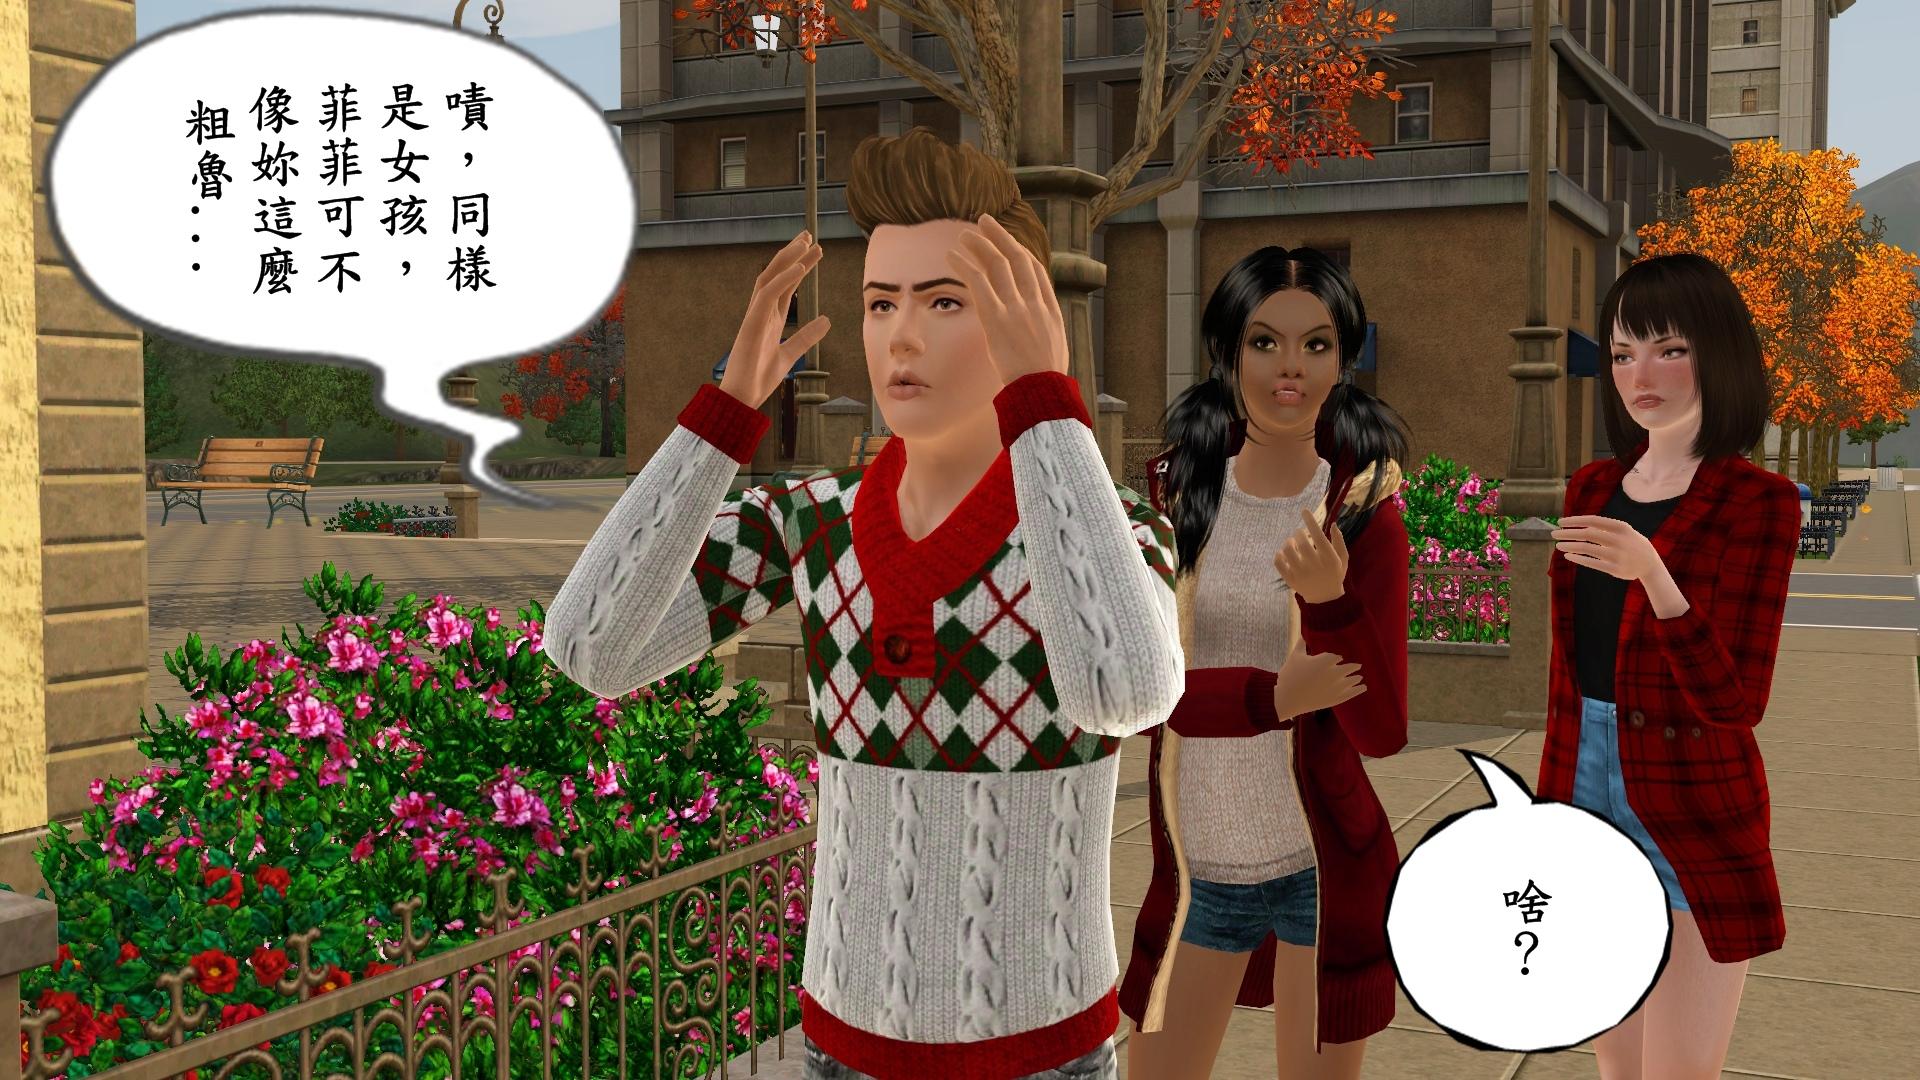 B05嘖同樣是女孩,菲菲可不像妳這麼粗魯 啥?.jpg